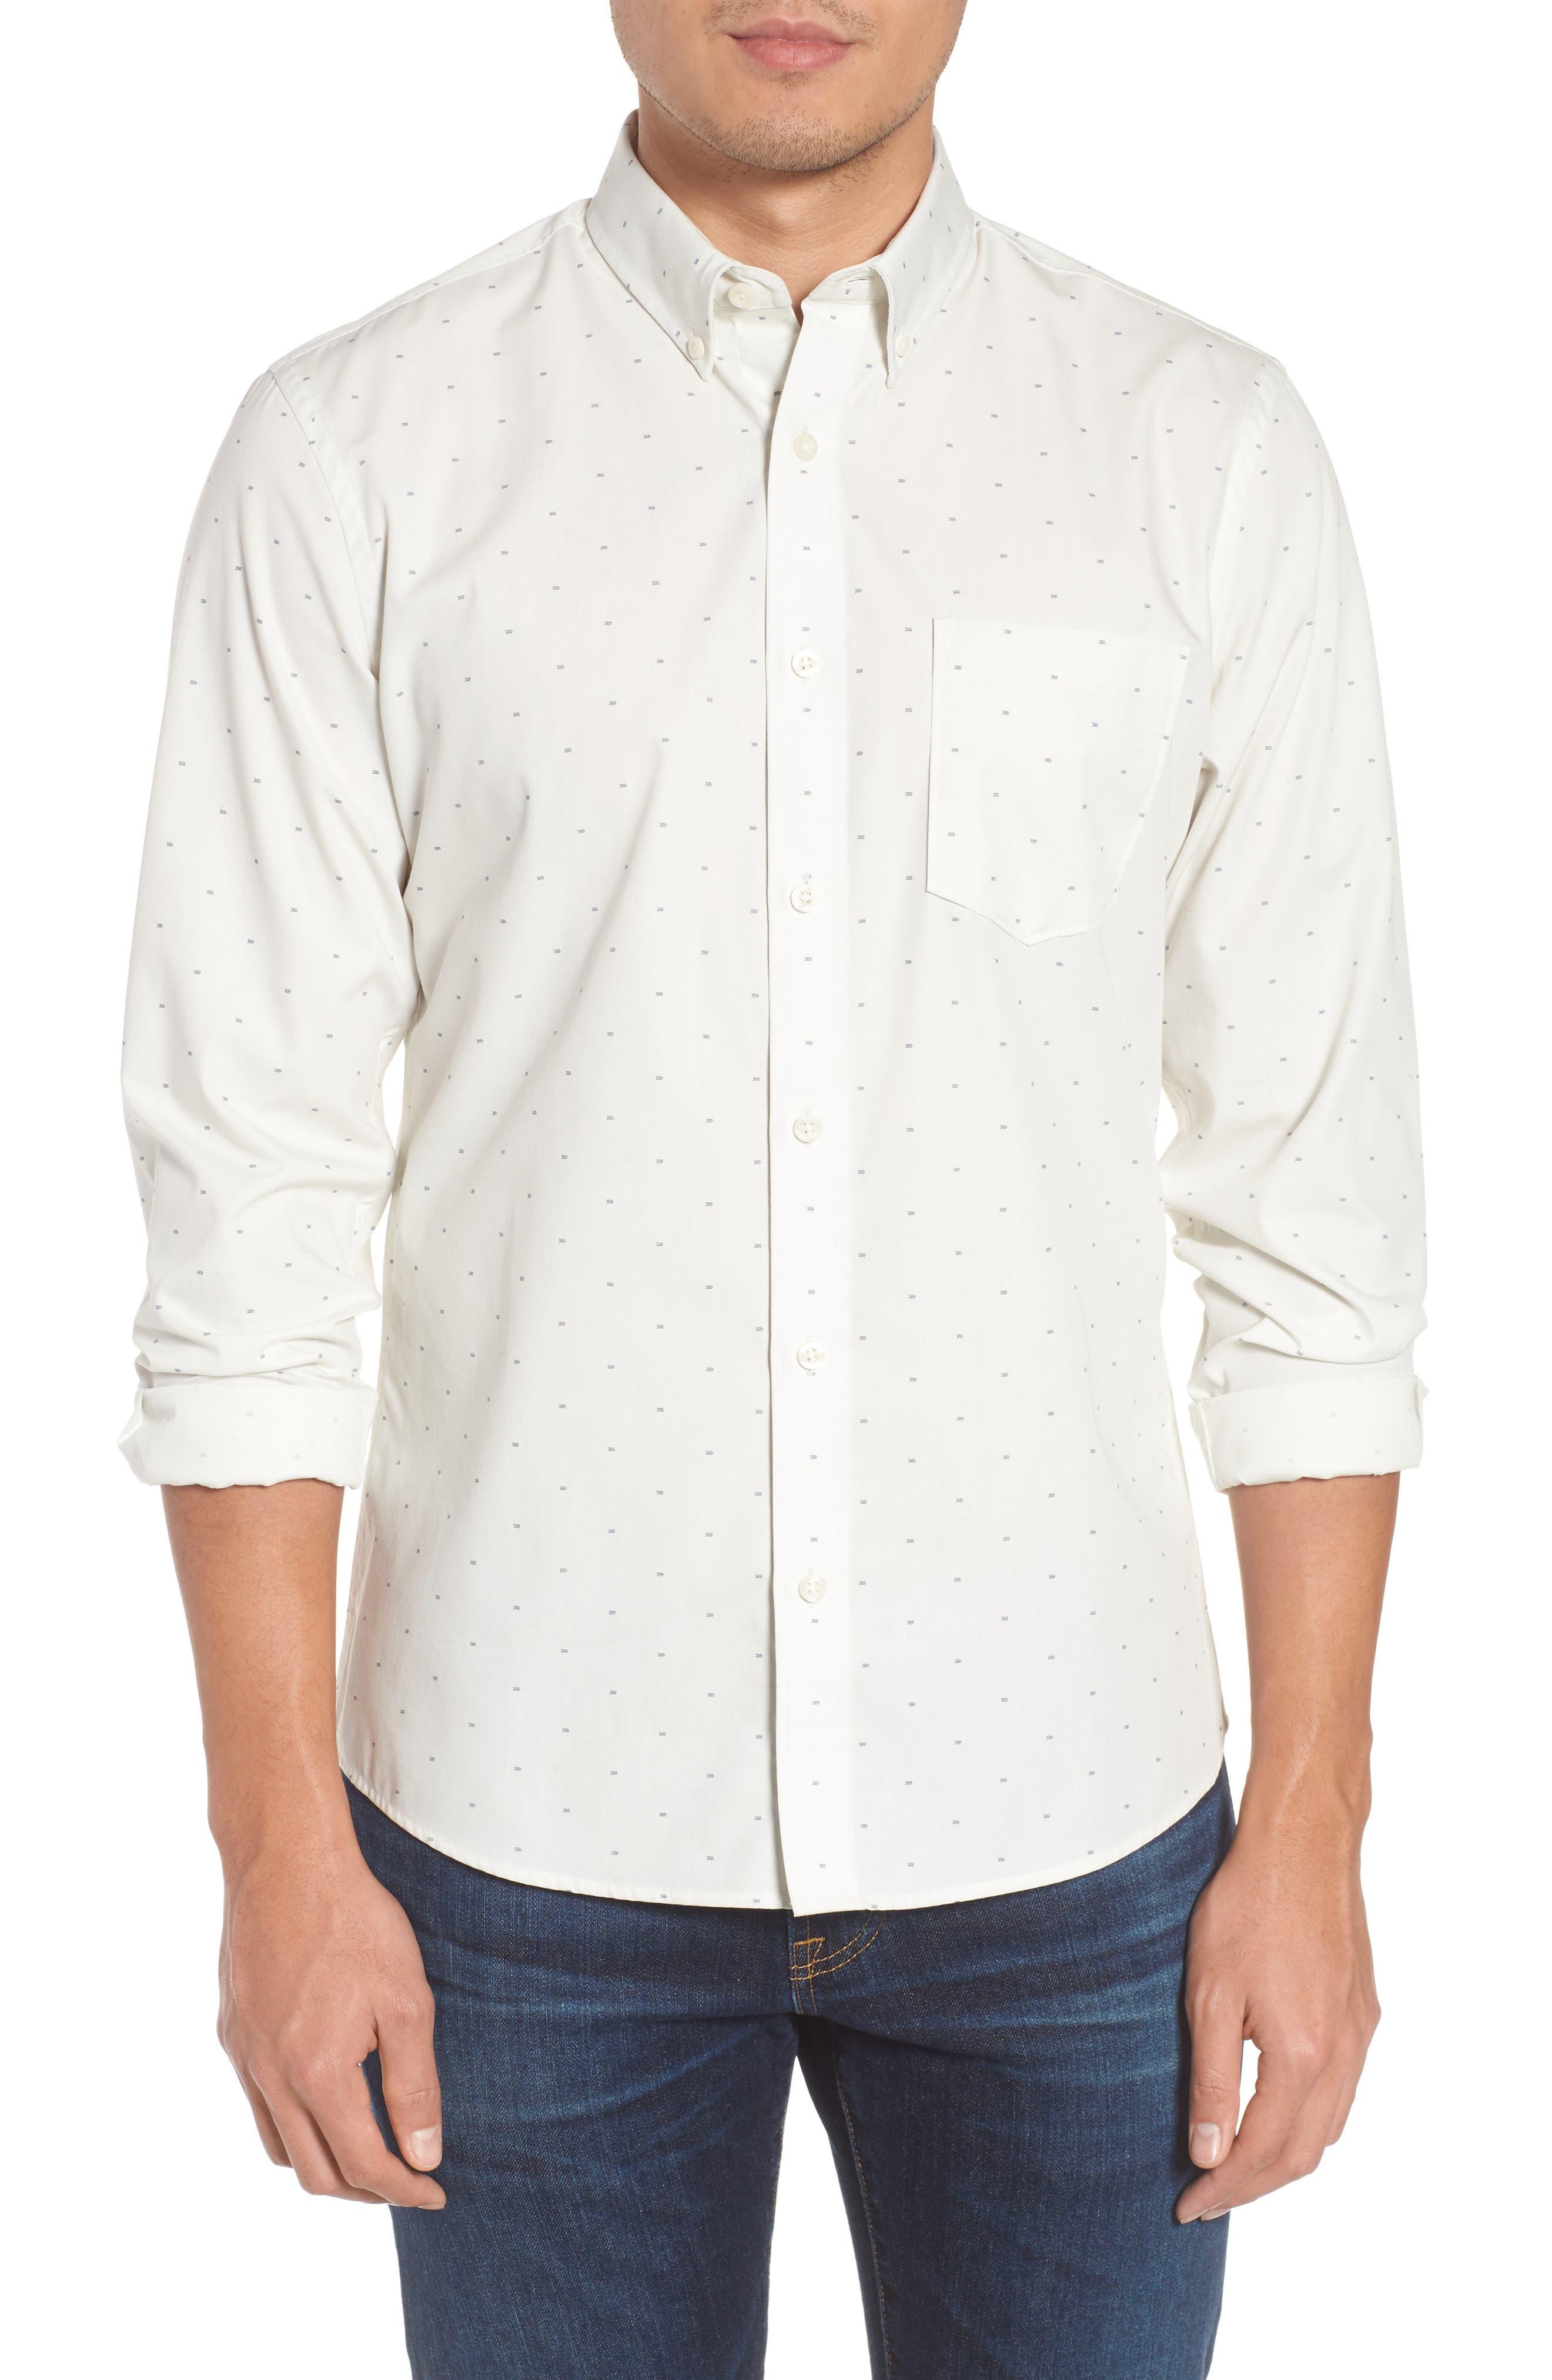 Nordstrom Men's Shop Trim Fit Non-Iron Dobby Sport Shirt